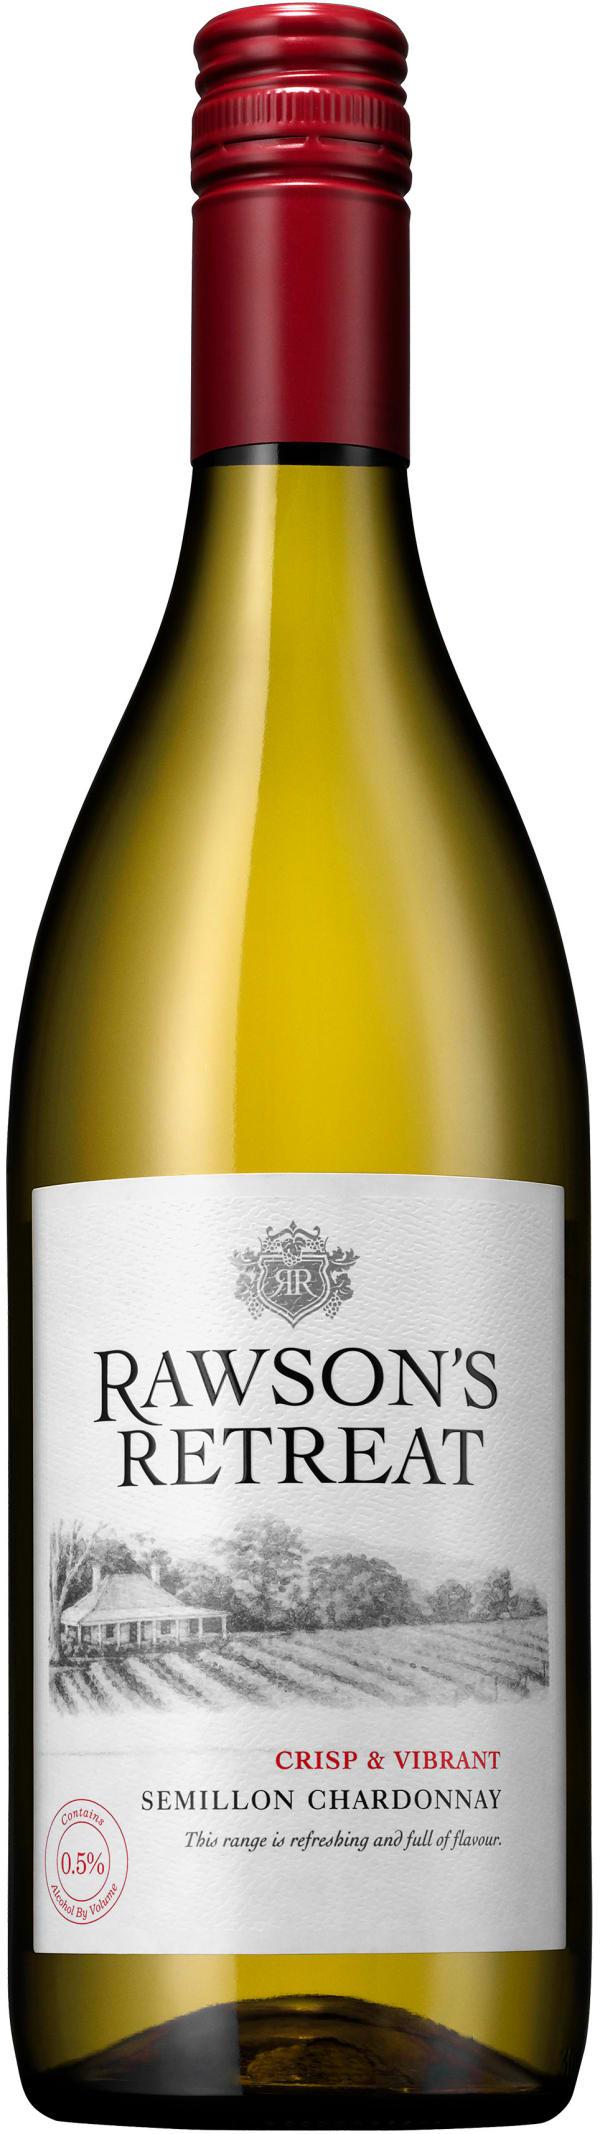 Rawson's Retreat Low Alcohol Semillon Chardonnay